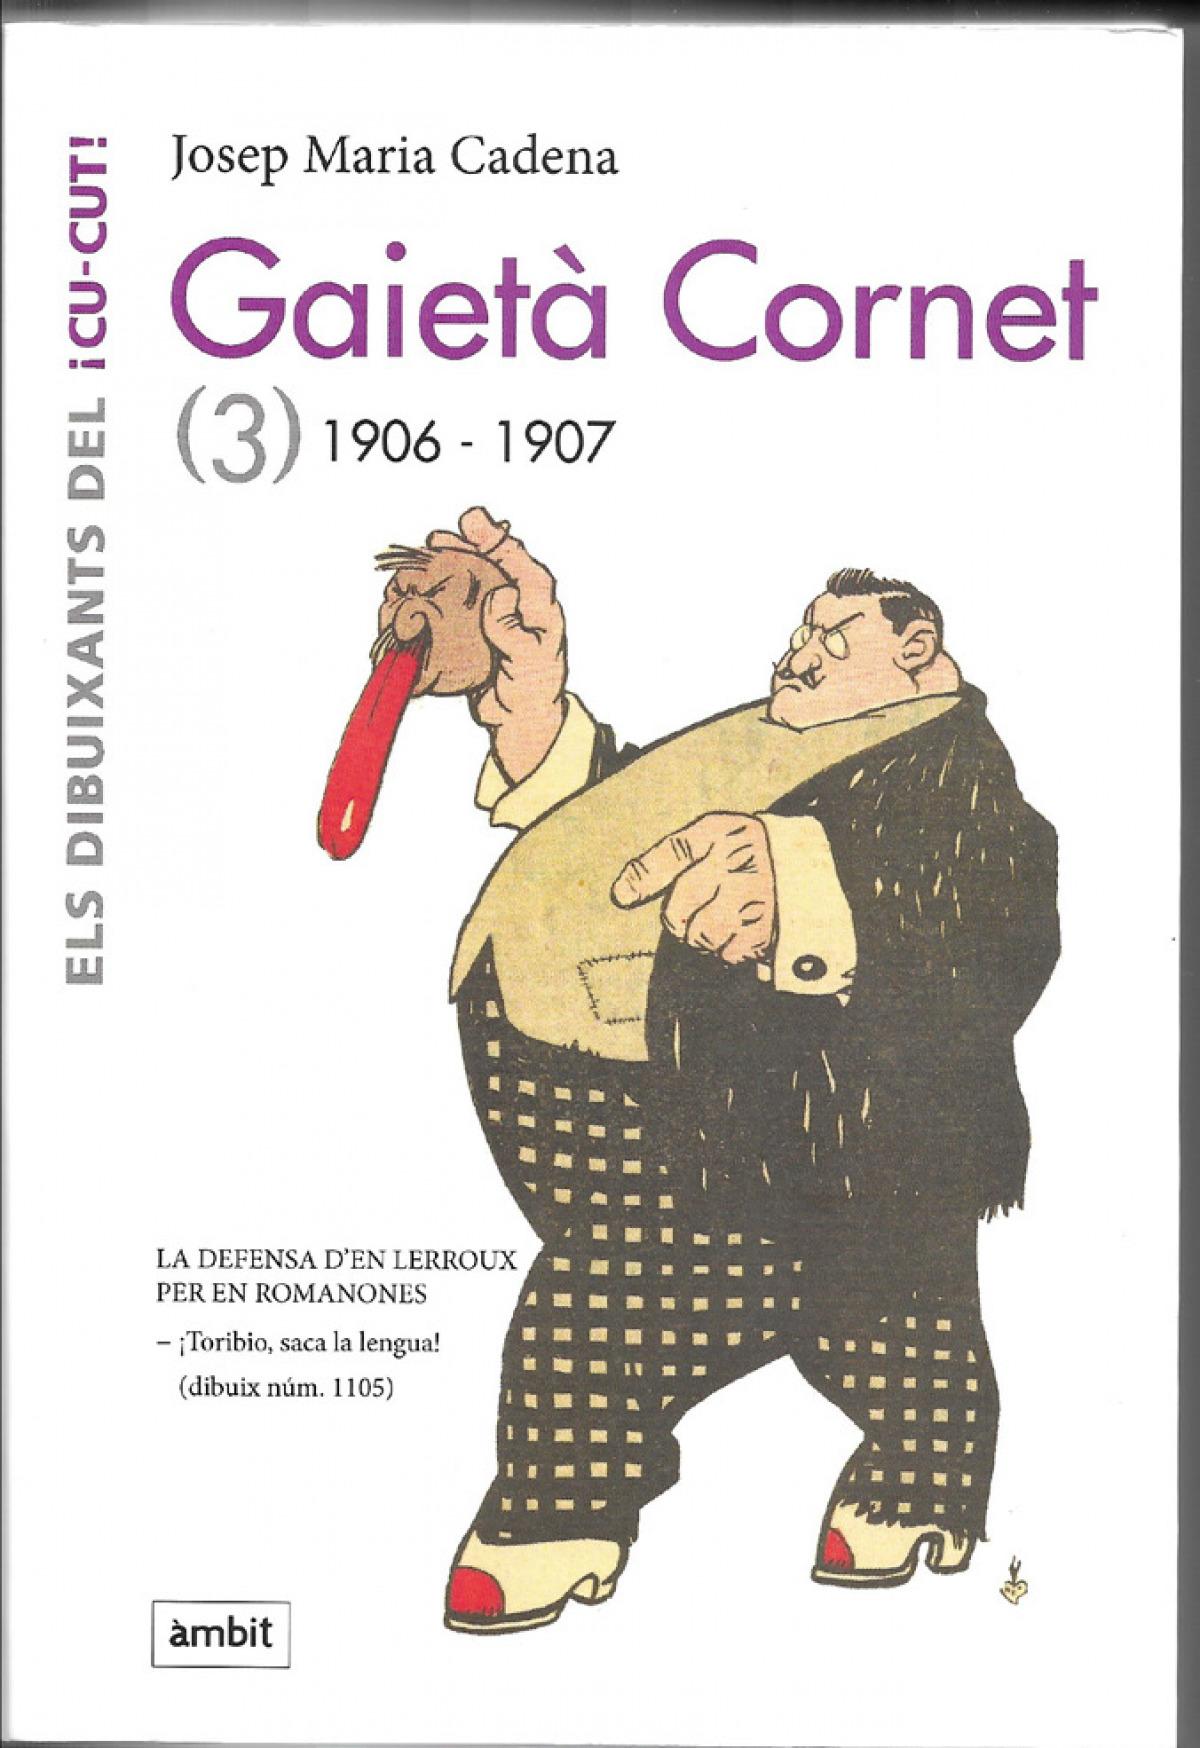 Gaietà Cornet Vol. 3 (1906-1907)